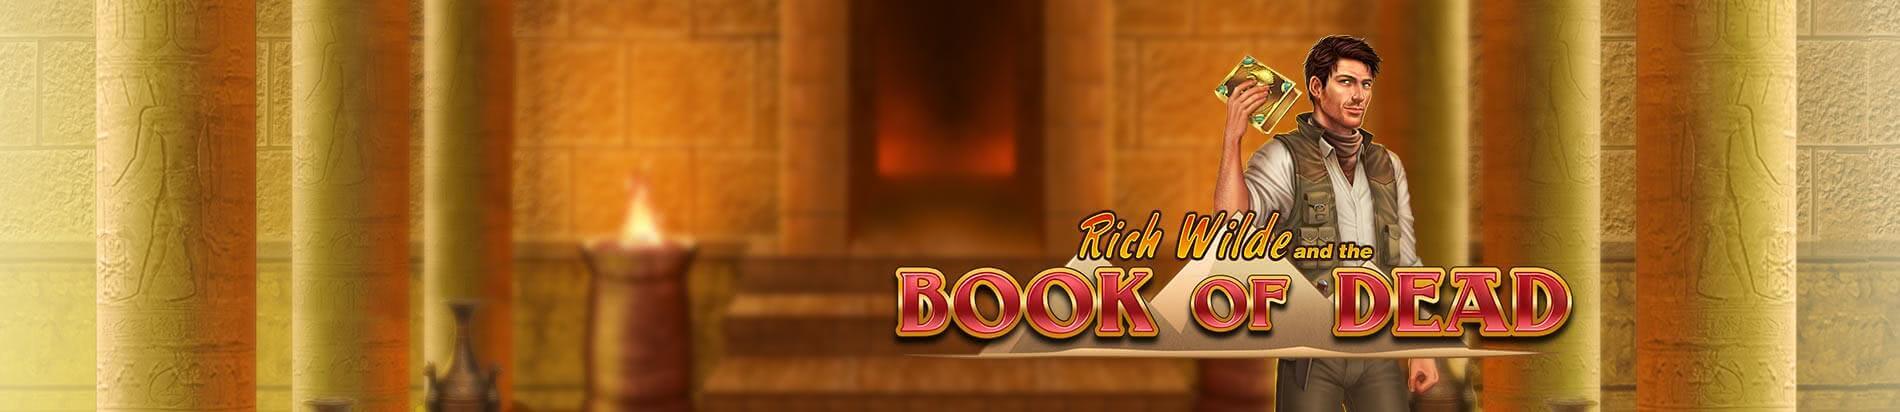 book of dead logo long